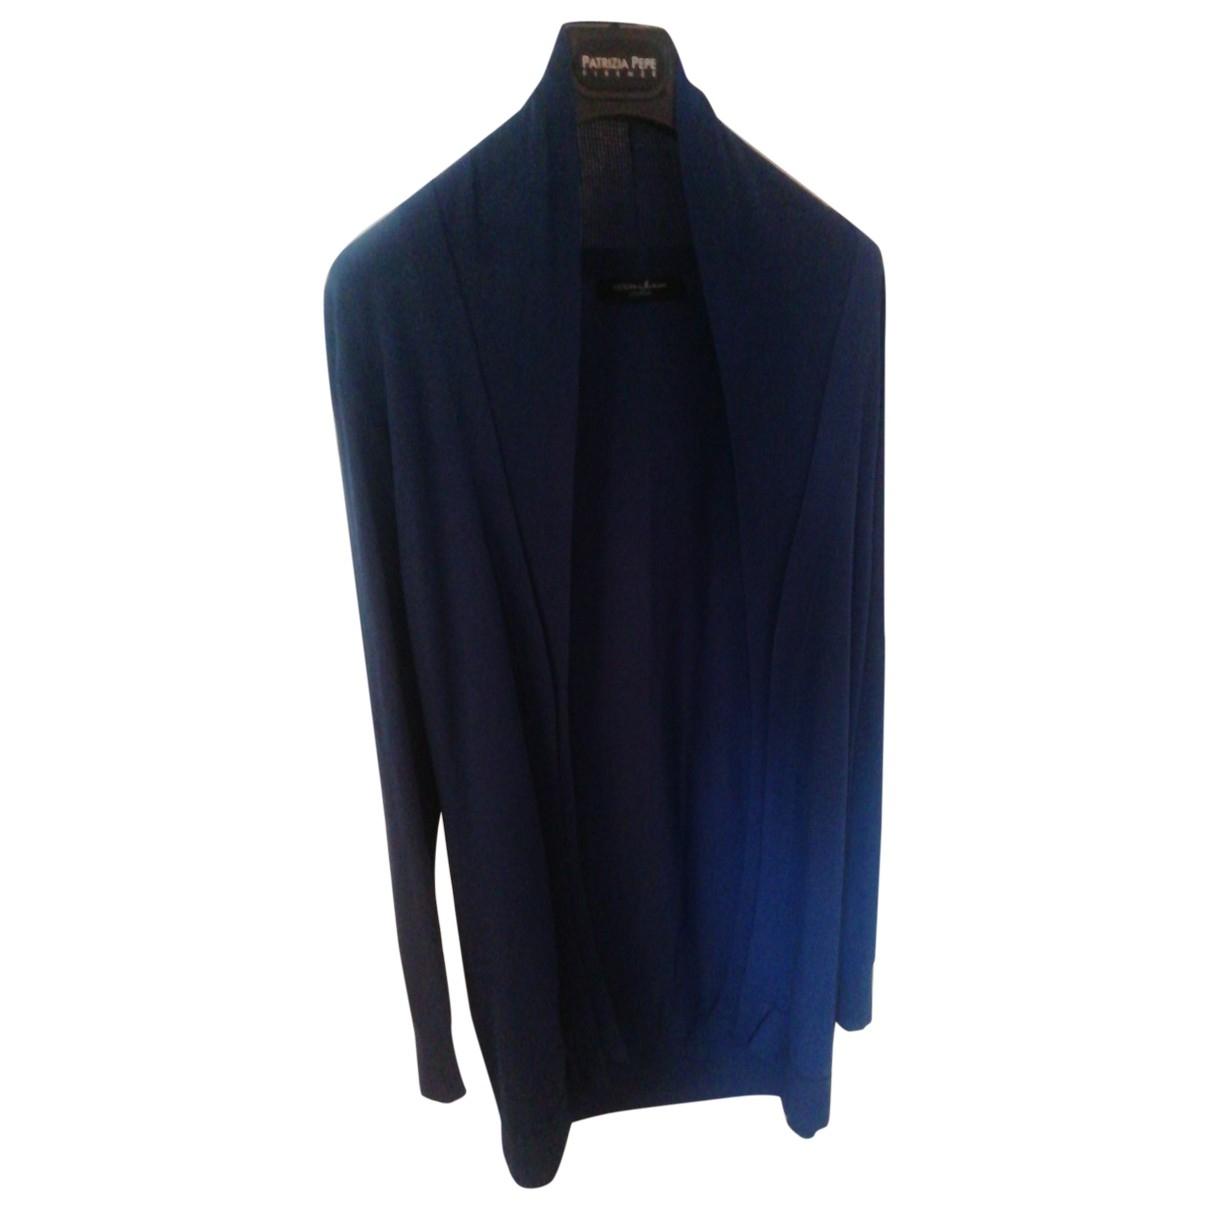 Guess \N Pullover in  Blau Viskose